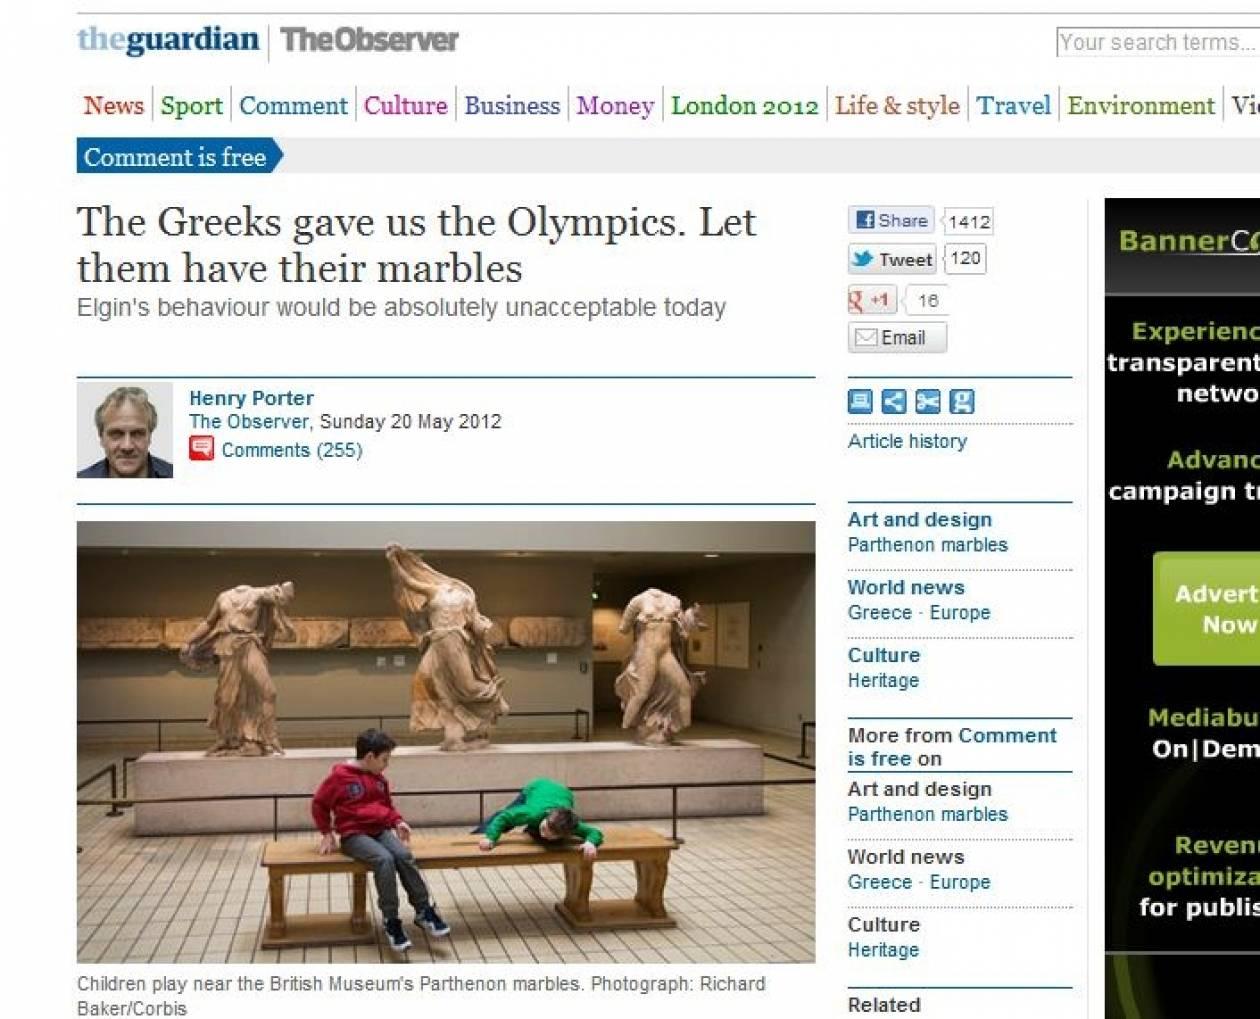 Guardian: Ας δώσουμε στους Έλληνες πίσω τα Γλυπτά του Παρθενώνα